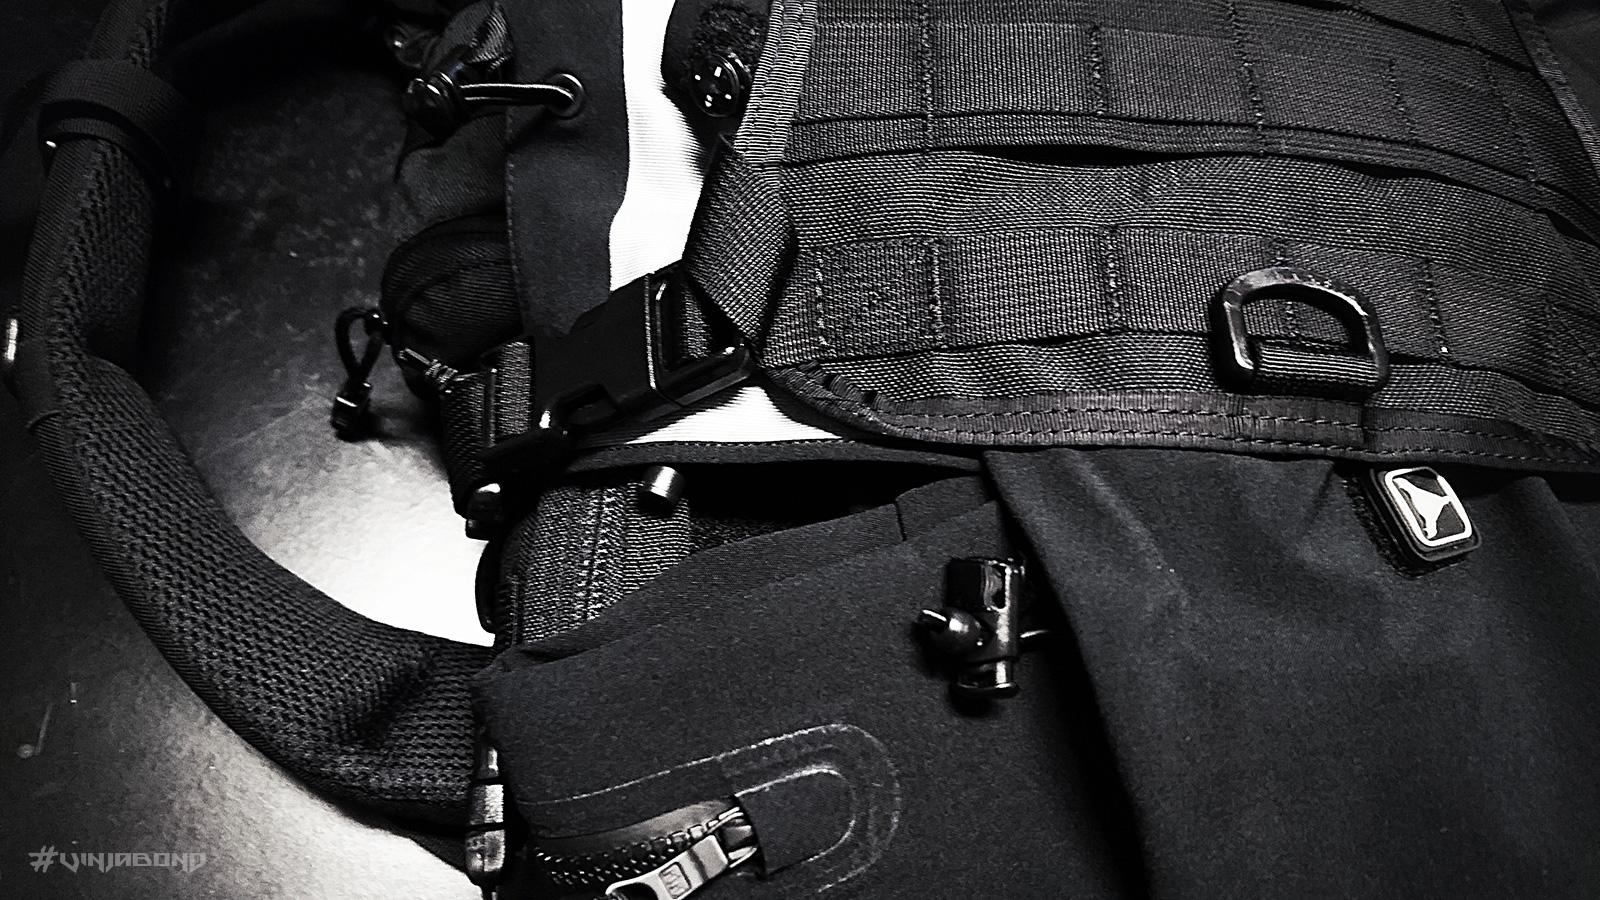 - Transporter Tail w/ Stealth Hoodie LT Jacket -